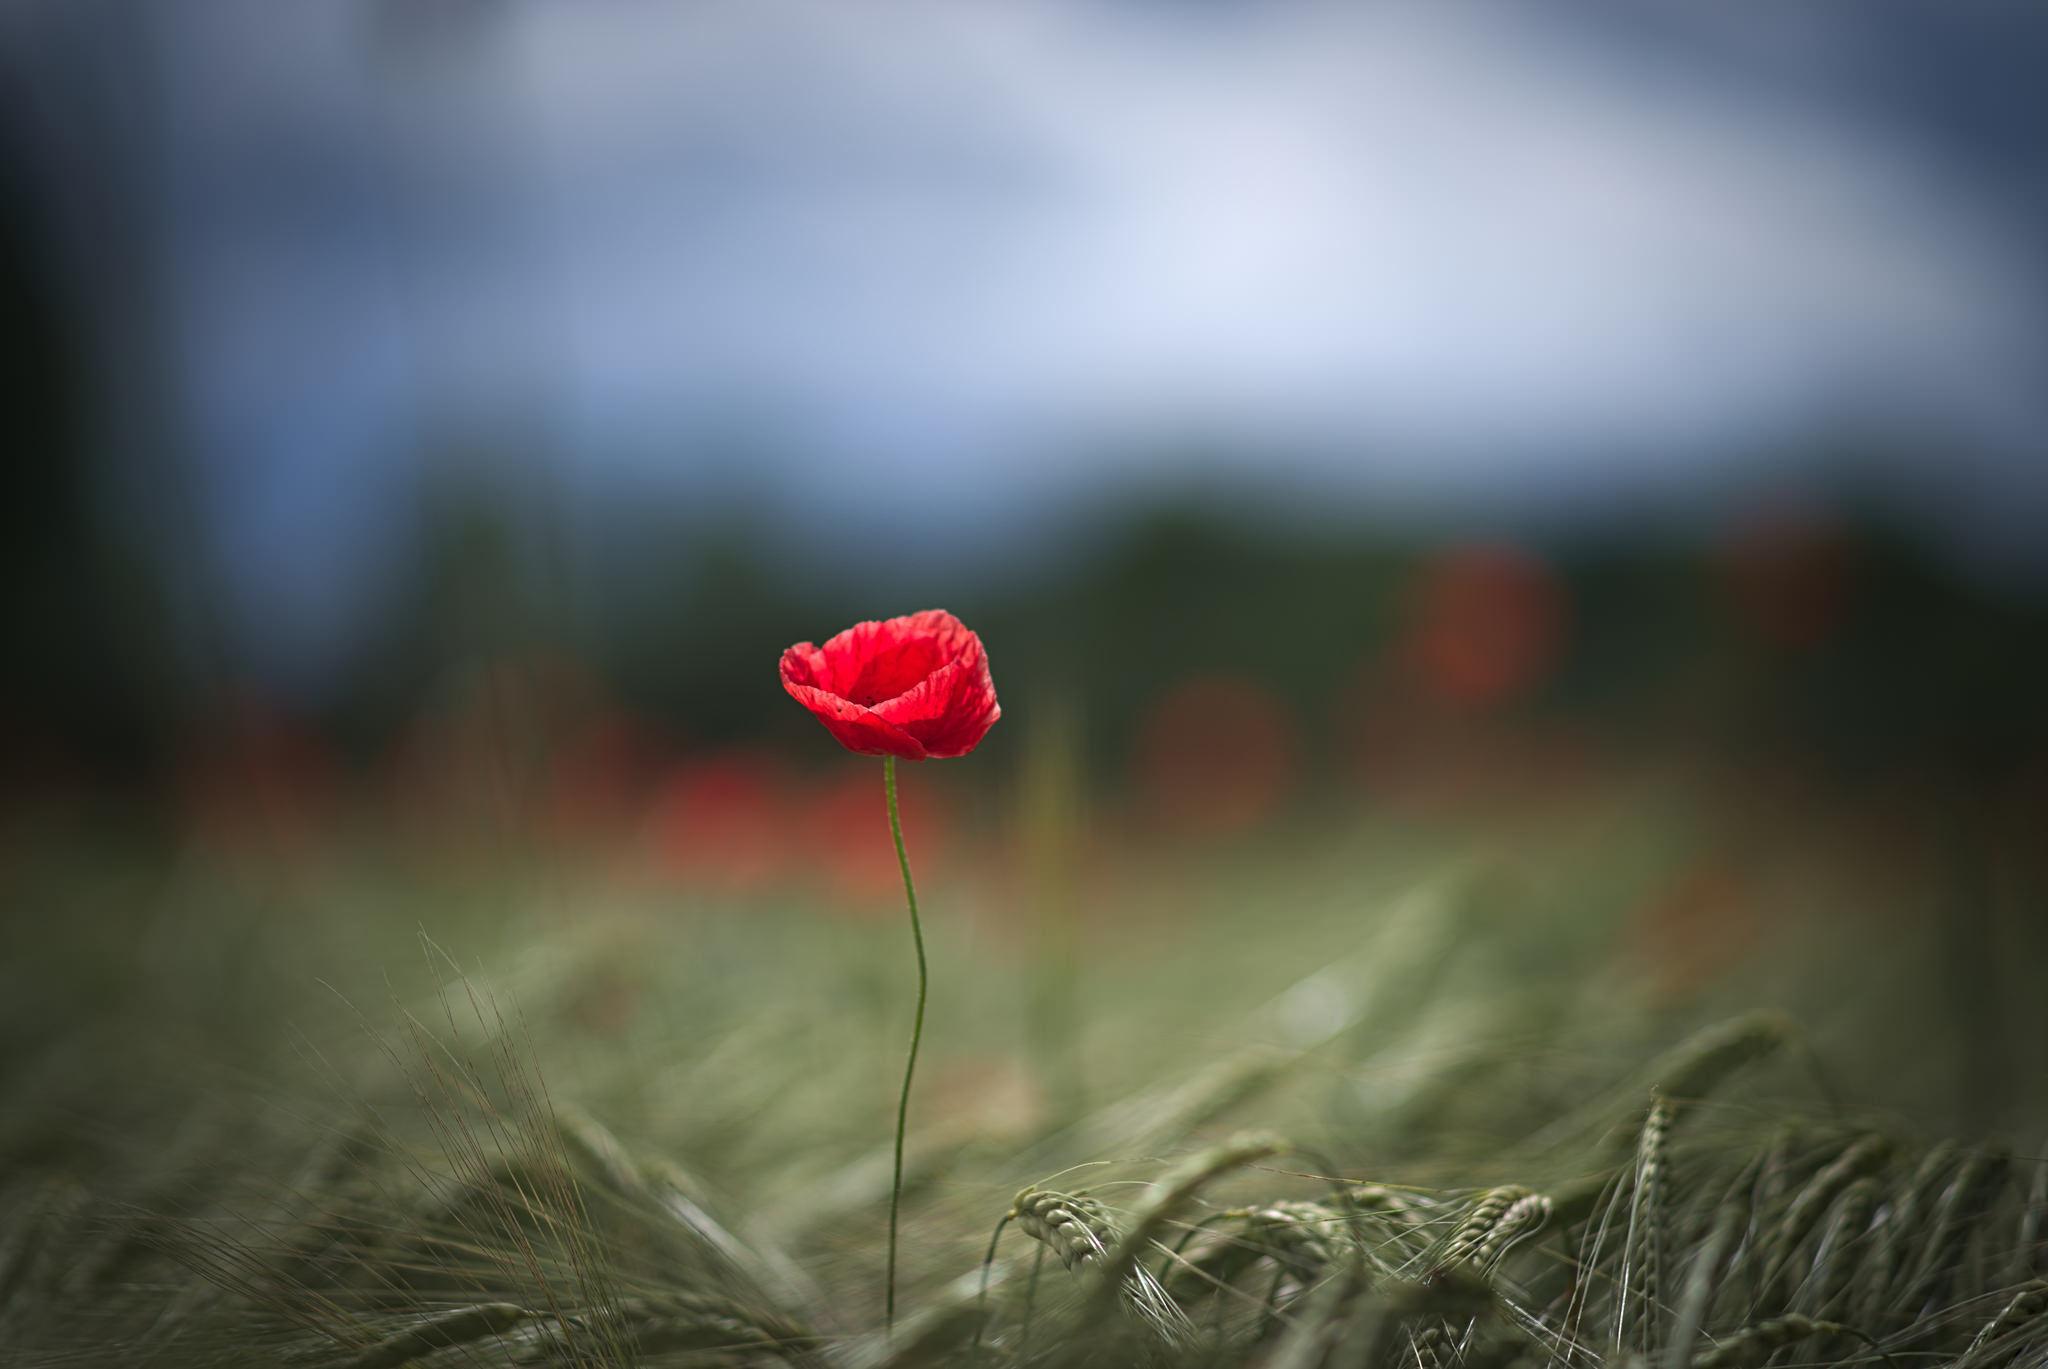 Картинка цветок одиночества